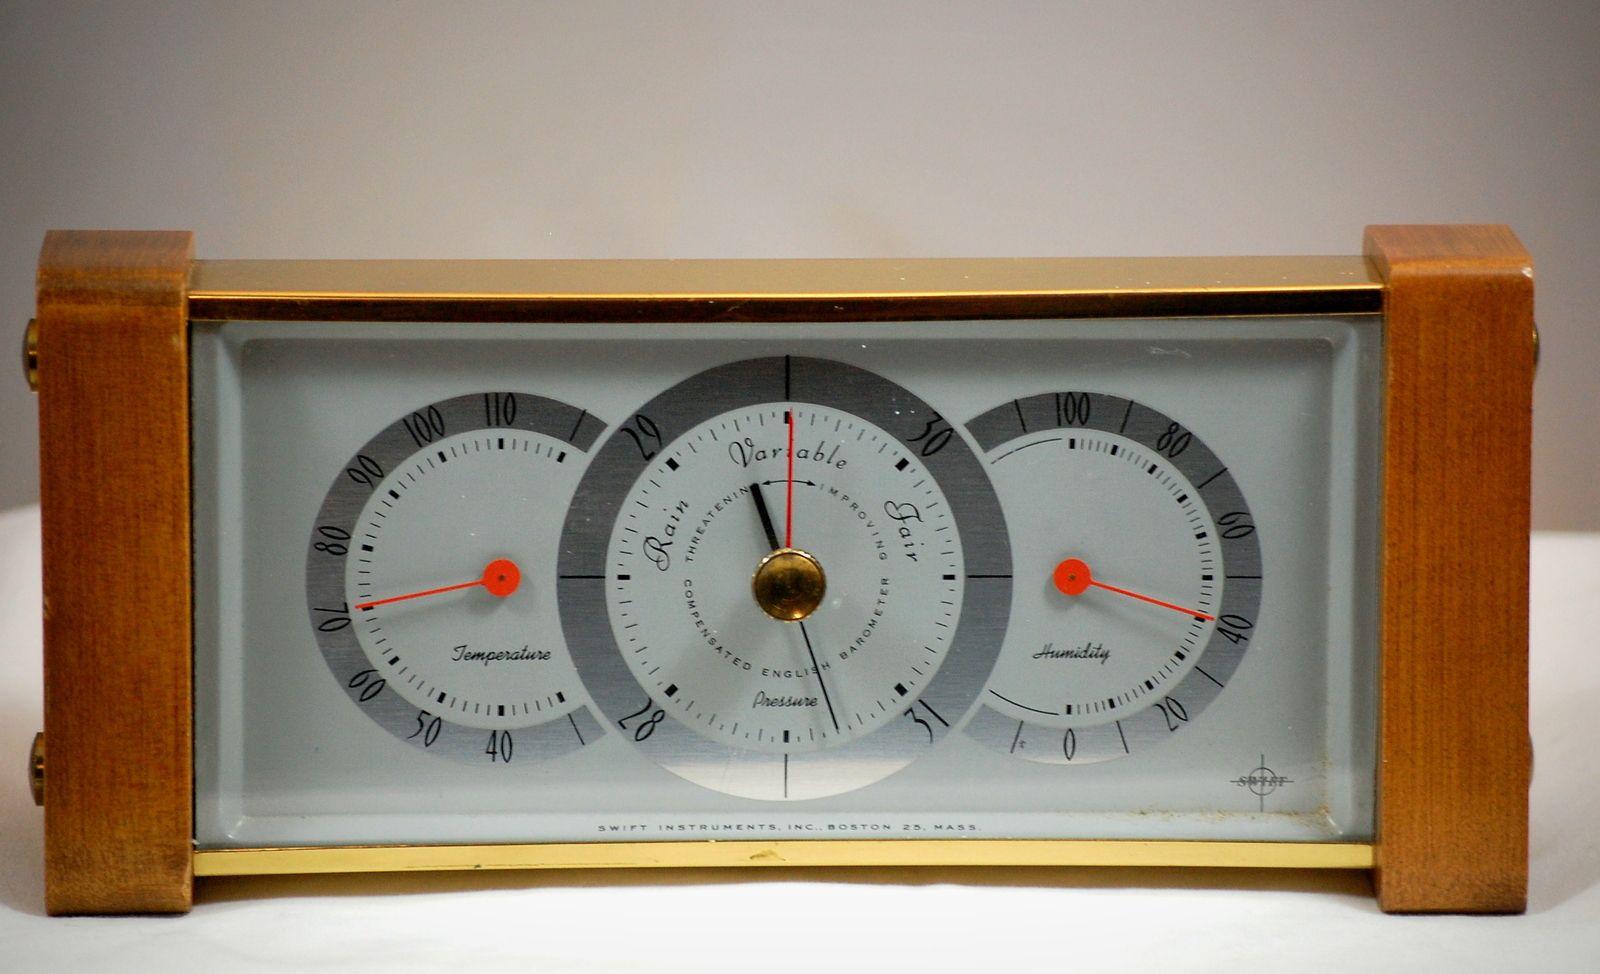 Desk Top Swift International Weather Station Hygrometer